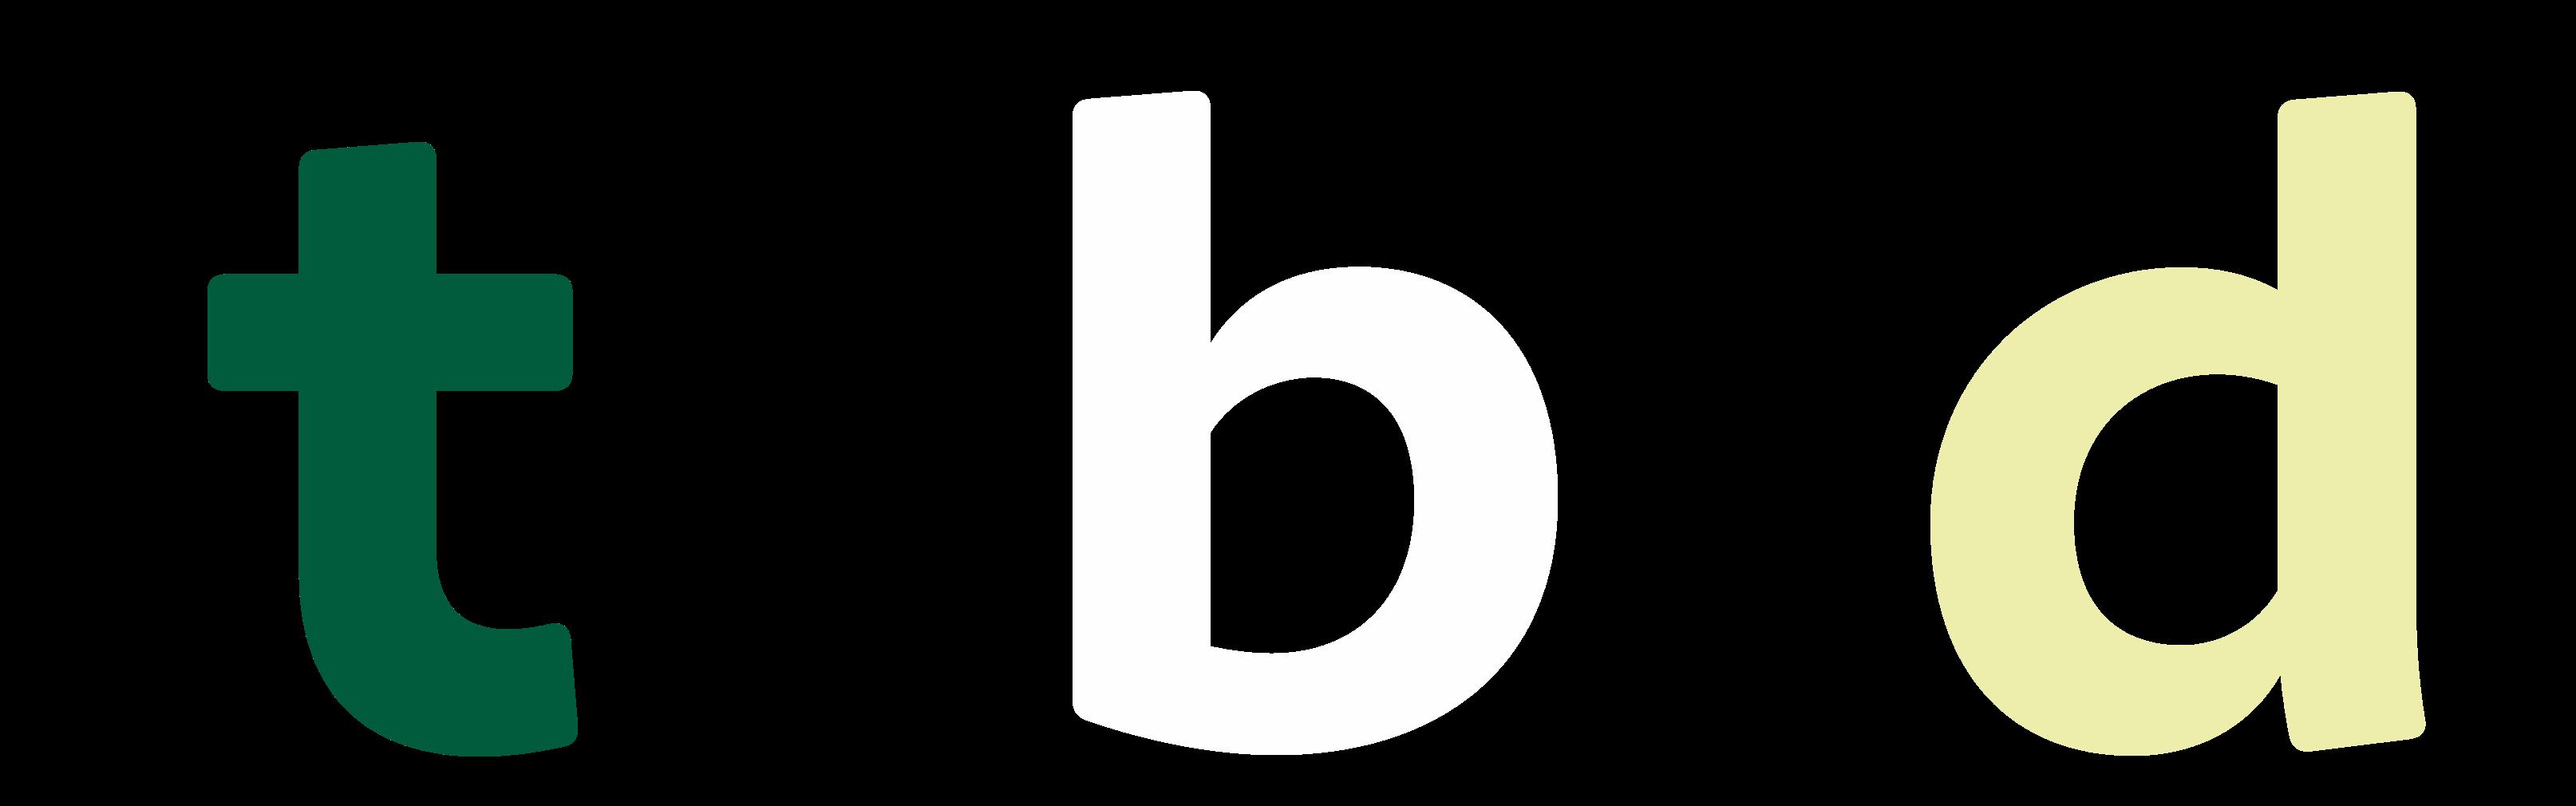 jyskebank_typo4